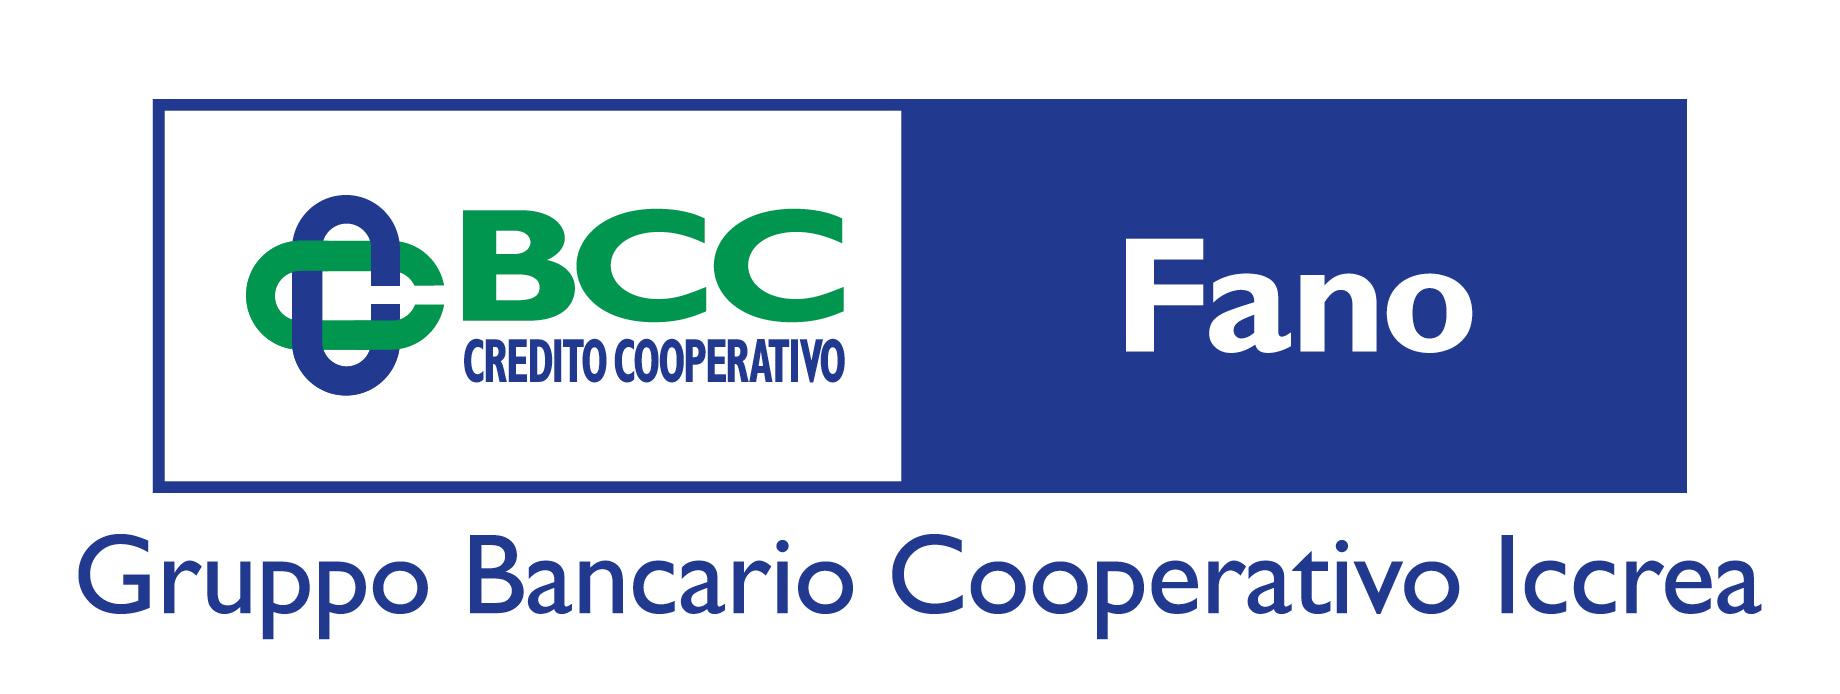 logo-bcc-jpeg